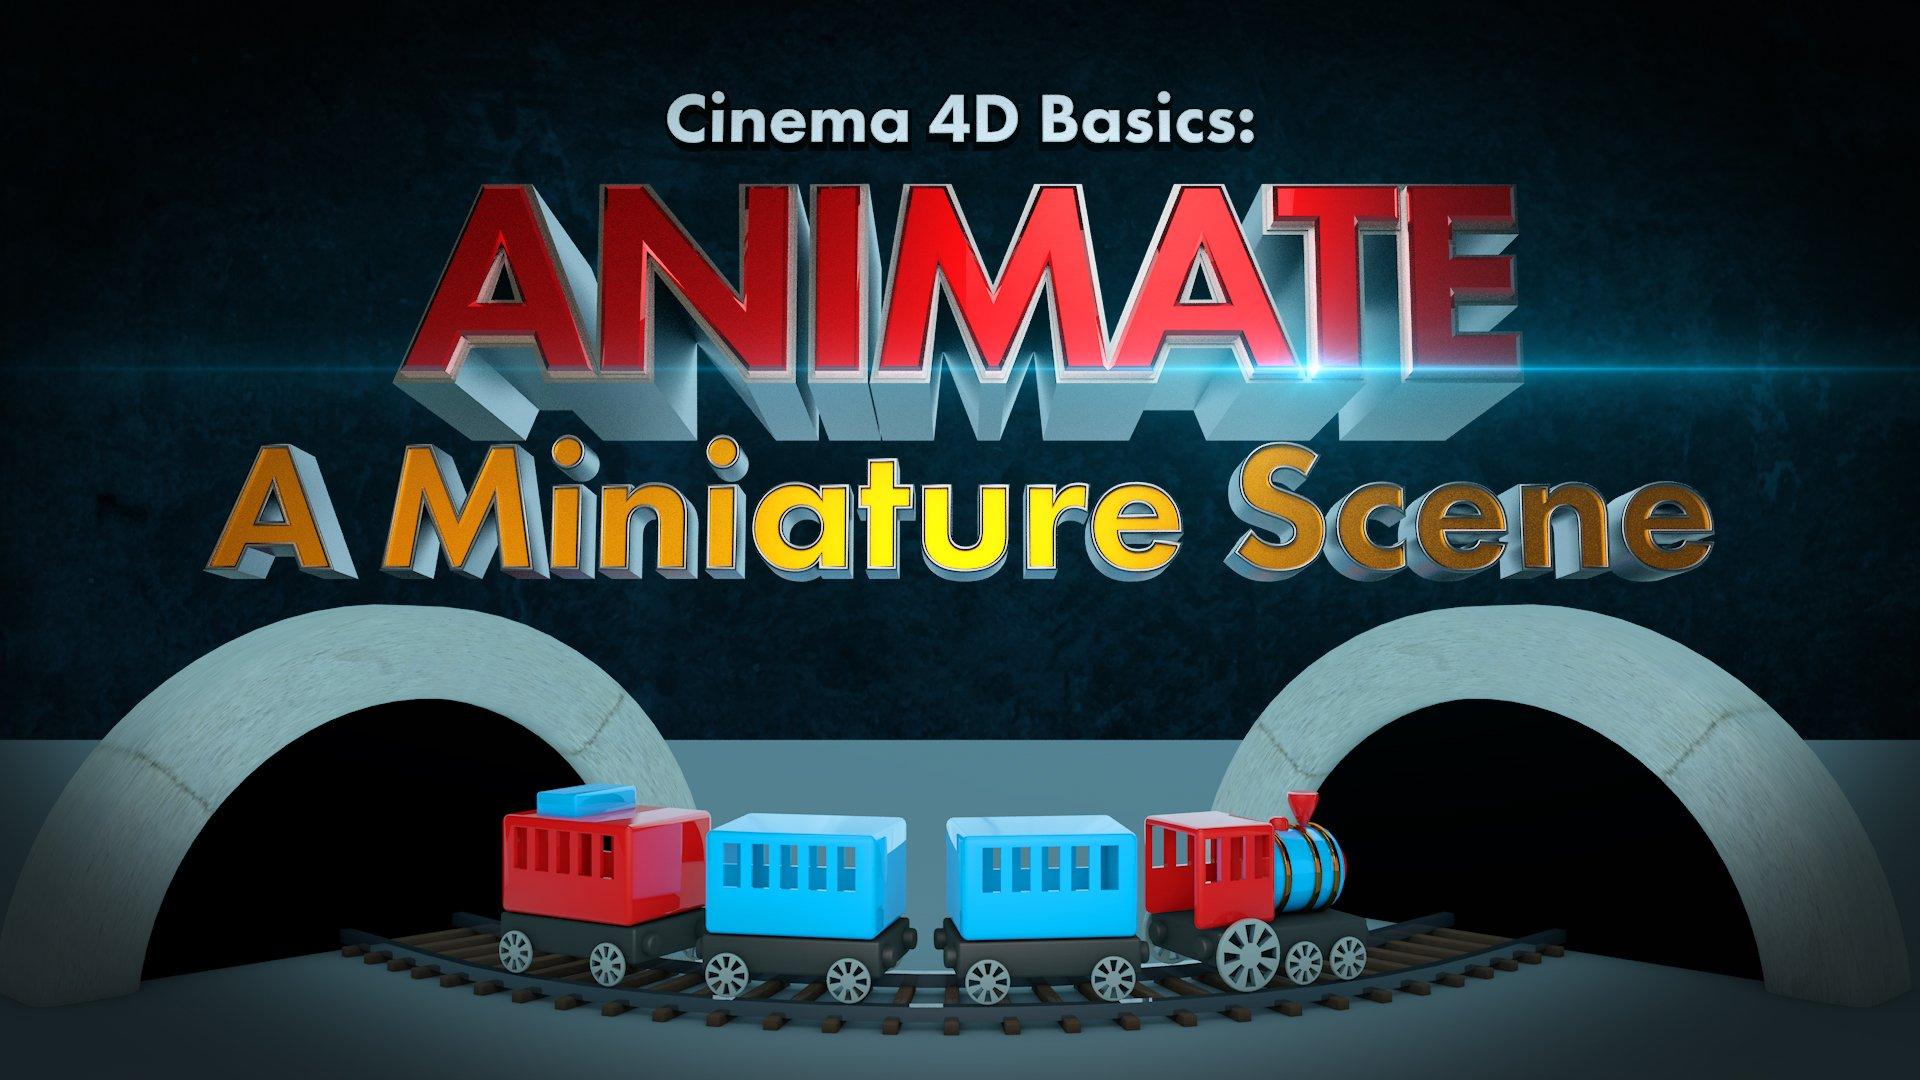 Cinema 4D Basics: Animate A Miniature Scene | Aaron Bartlett